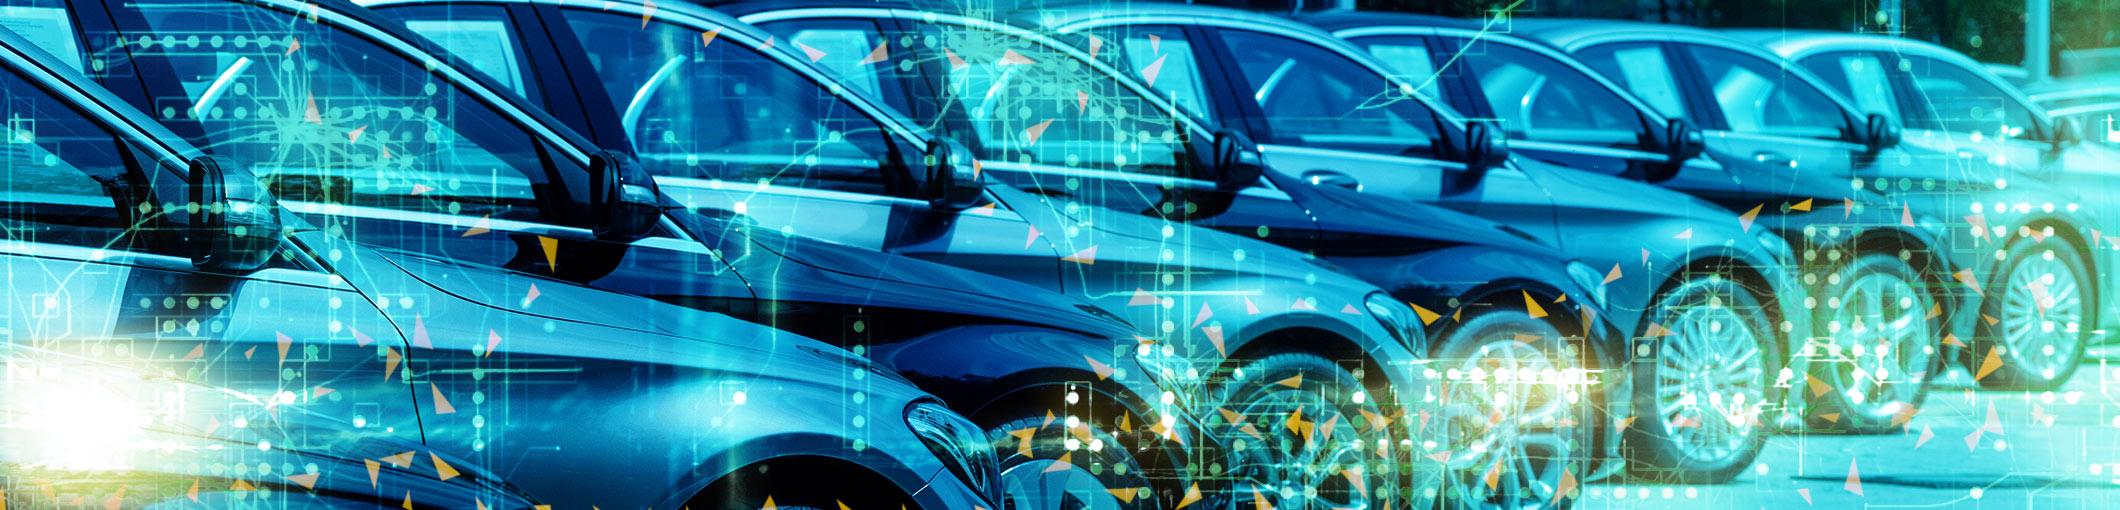 Fleet Dome, Automotive Cybersecurity, Fleet Cybersecurity